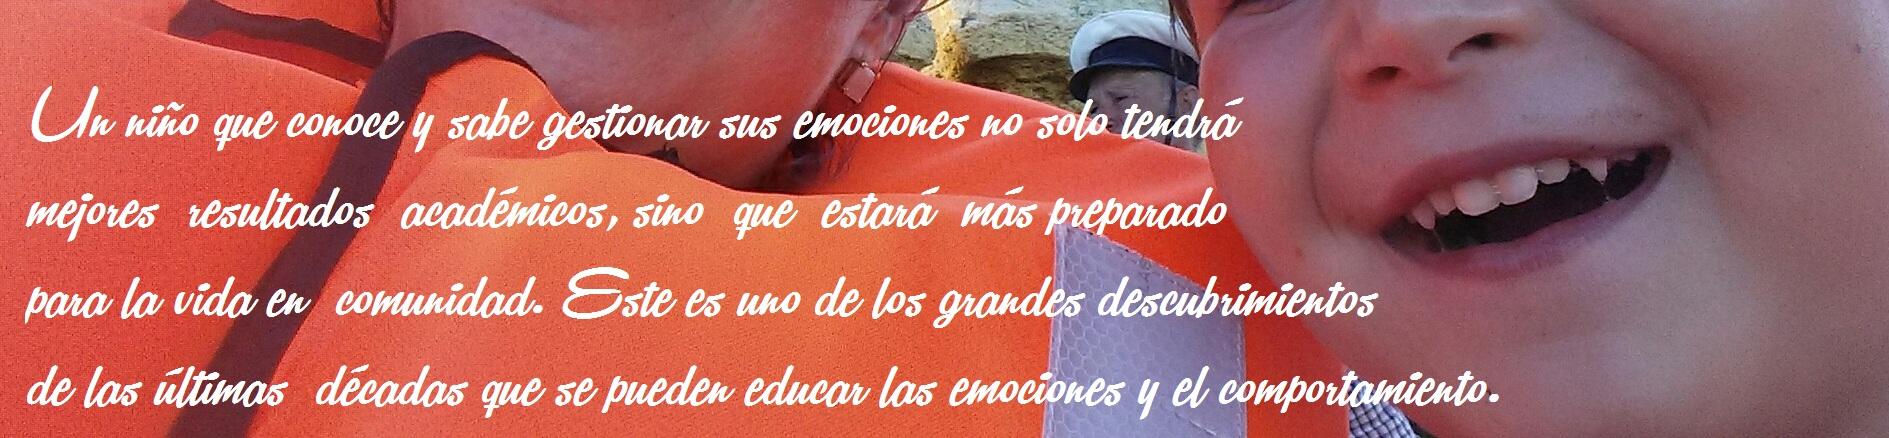 Inteligencia Emocional Infantil. Psico-Vida. Zaragoza